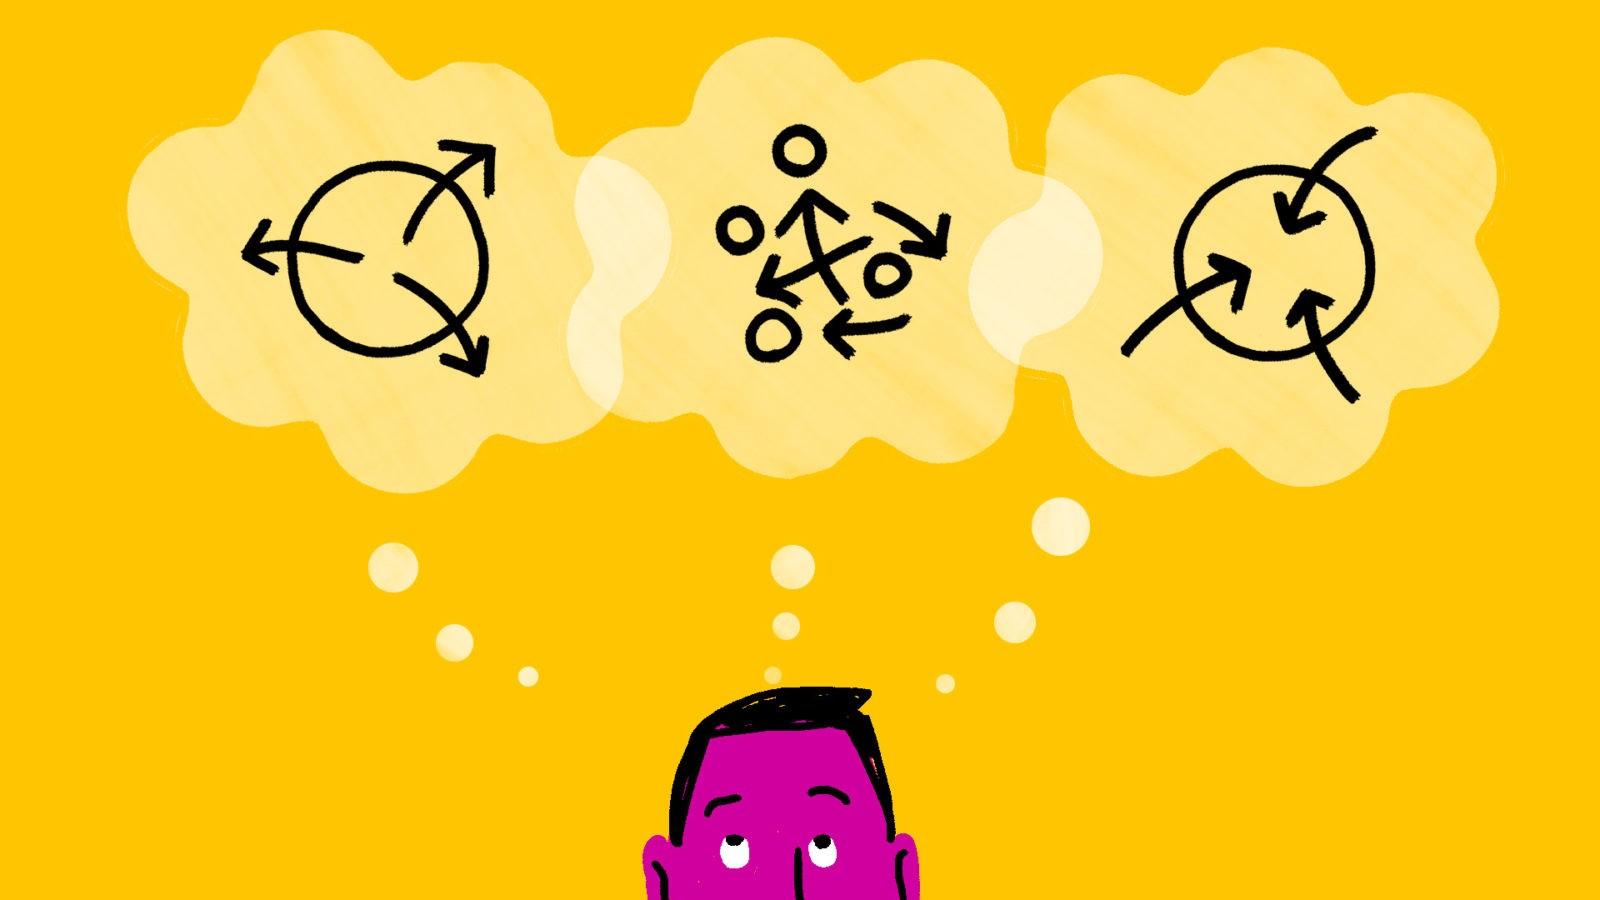 Design Thinking's Three Modes of Thinking: Open, Explore, Close